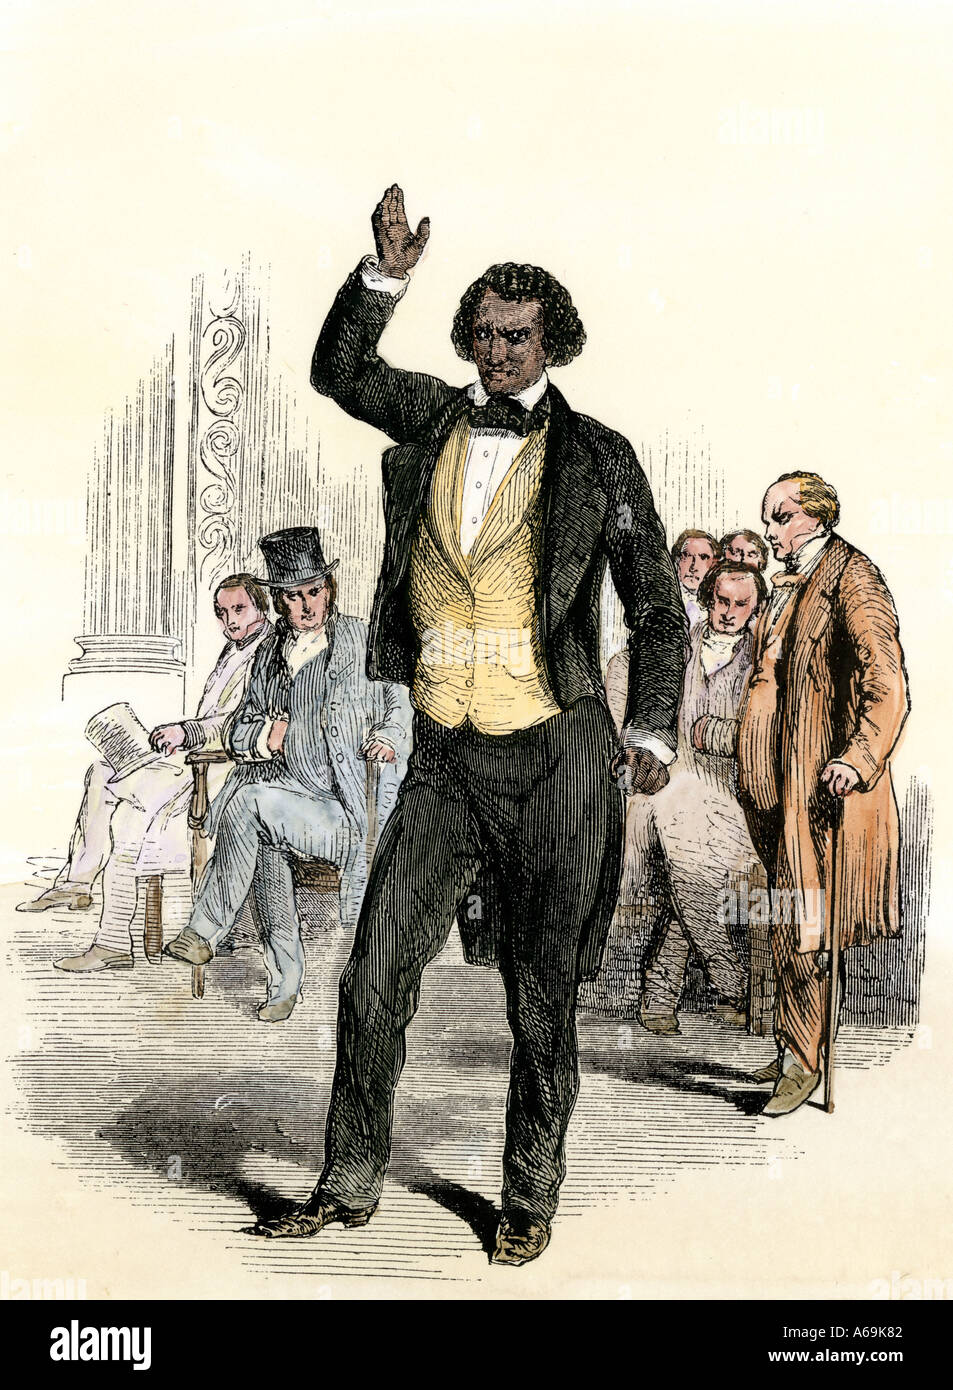 Frederick Douglass' July 4 speeches trace American history